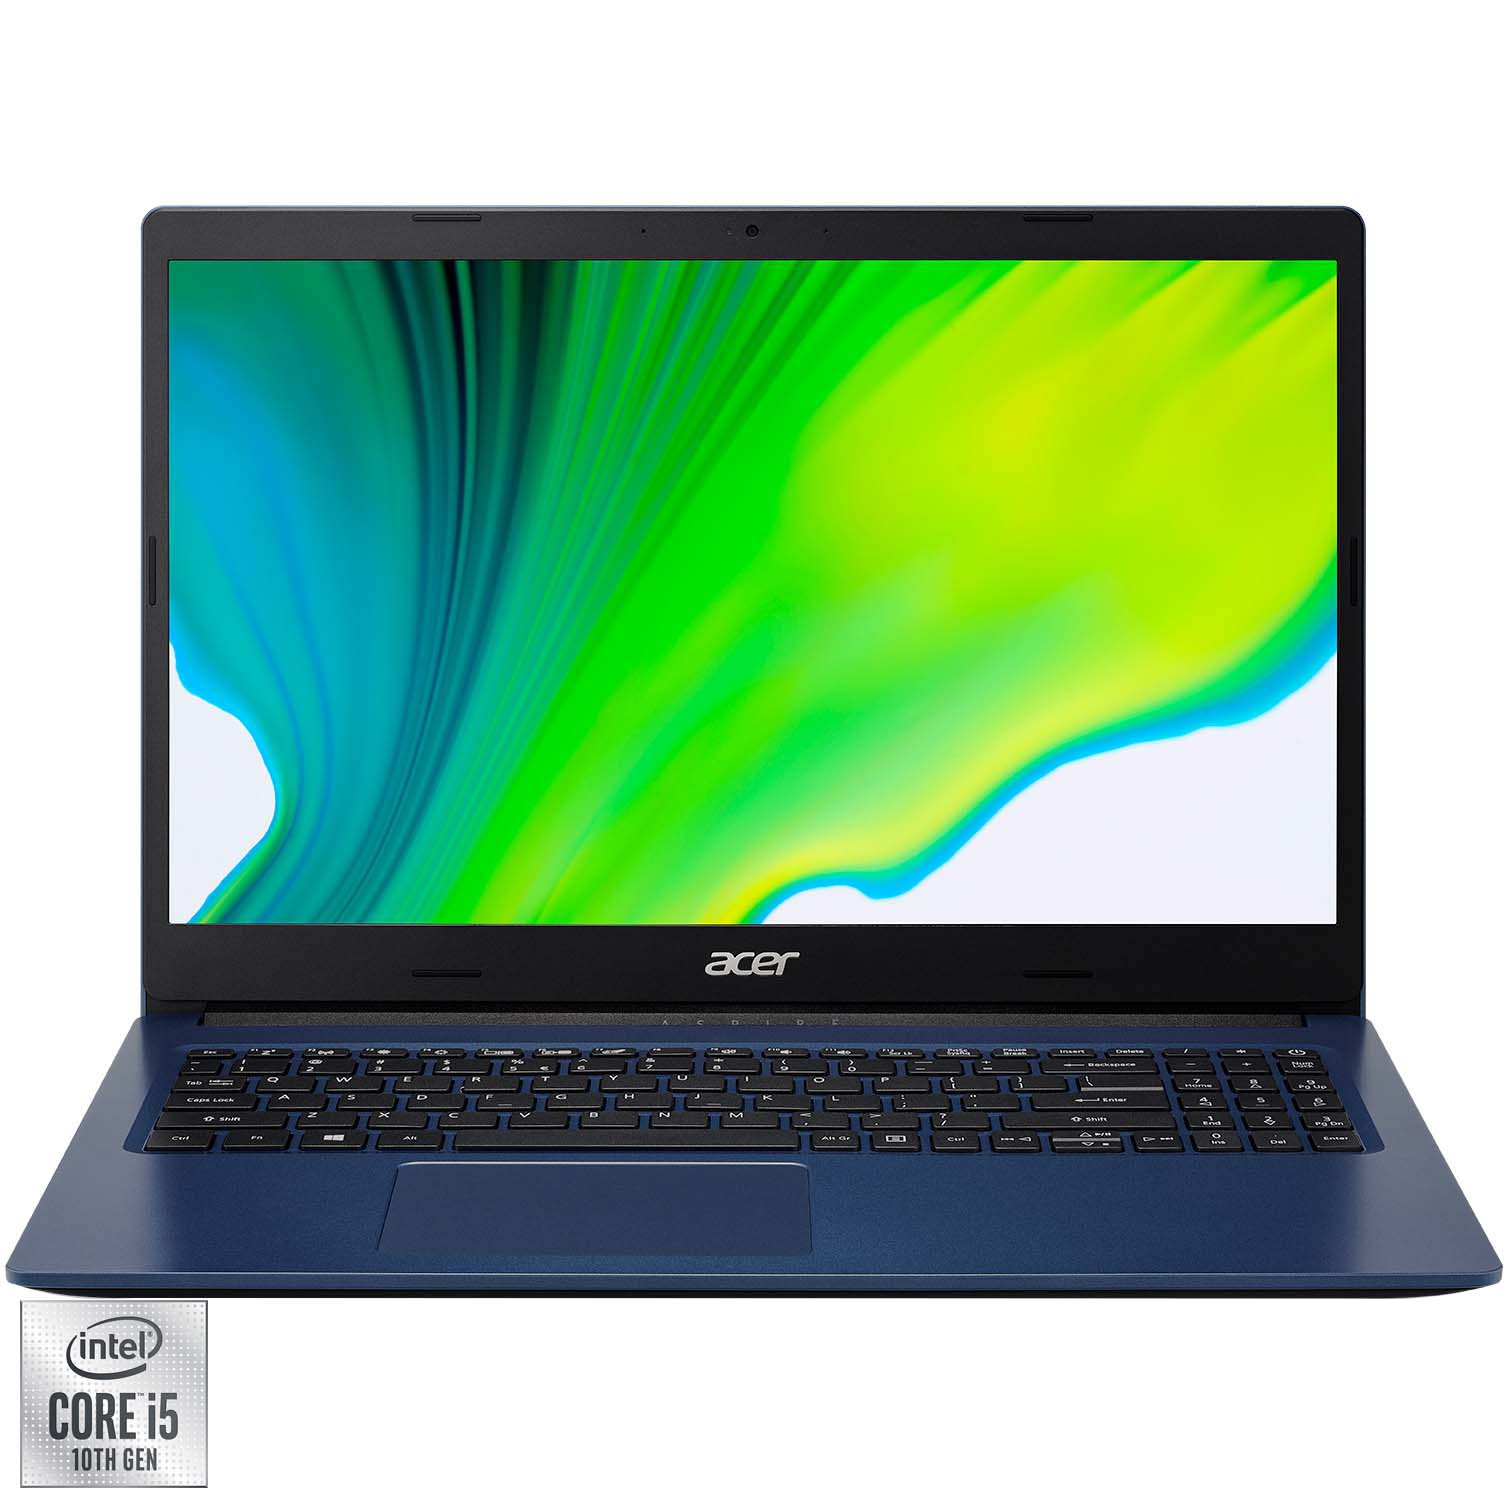 "Fotografie Laptop Acer Aspire 3 A315-57G cu procesor Intel Core i5-1035G1 pana la 3.60 GHz, 15.6"", Full HD, 12GB, 256GB SSD, NVIDIA® GeForce® MX330 2GB, No OS, Albastru"